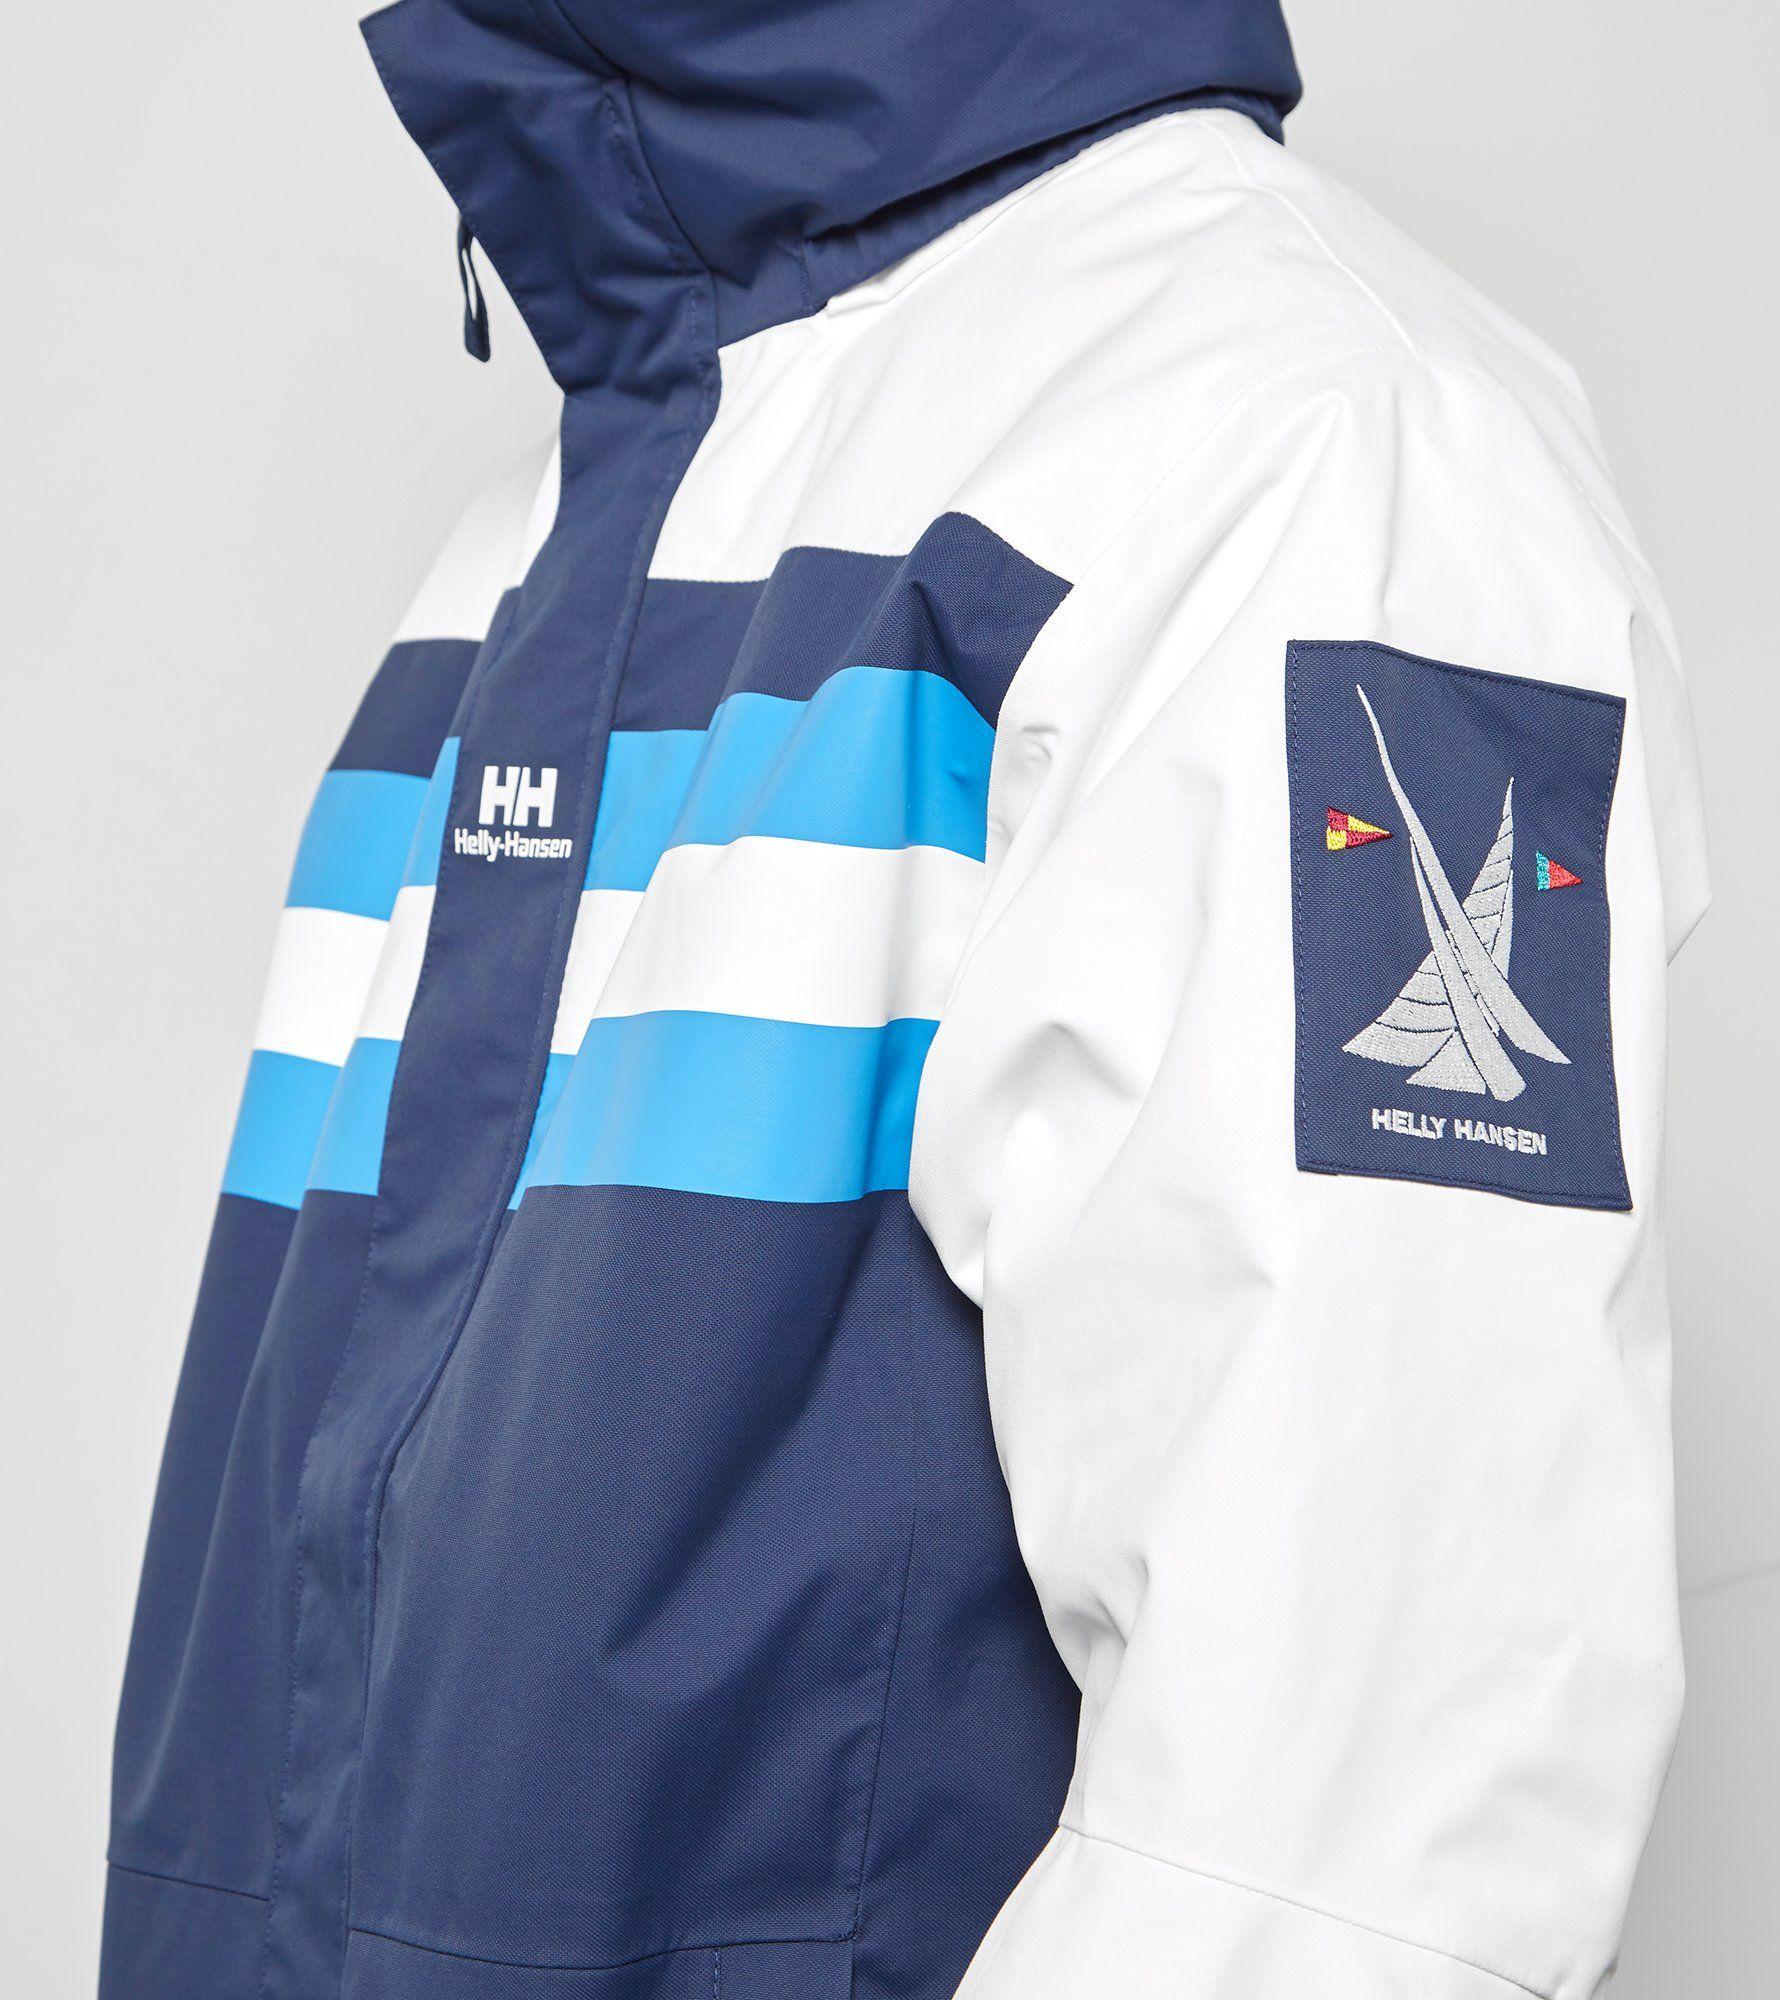 Helly Hansen Heritage Sailing Jacket